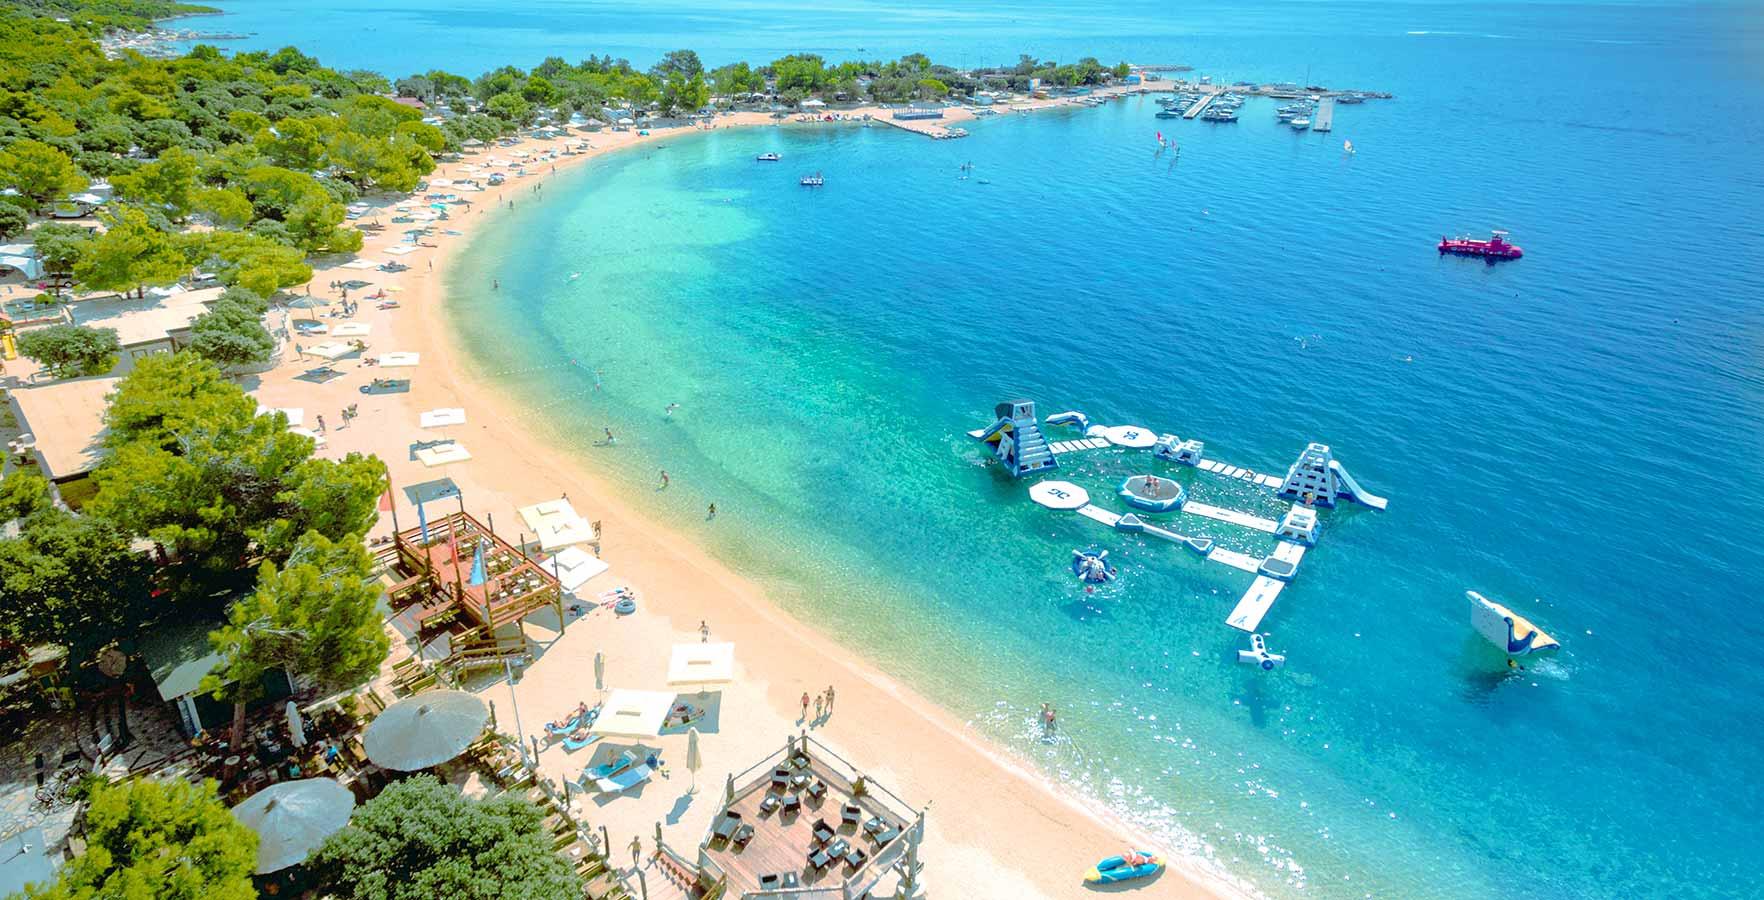 Village Of Island Park E